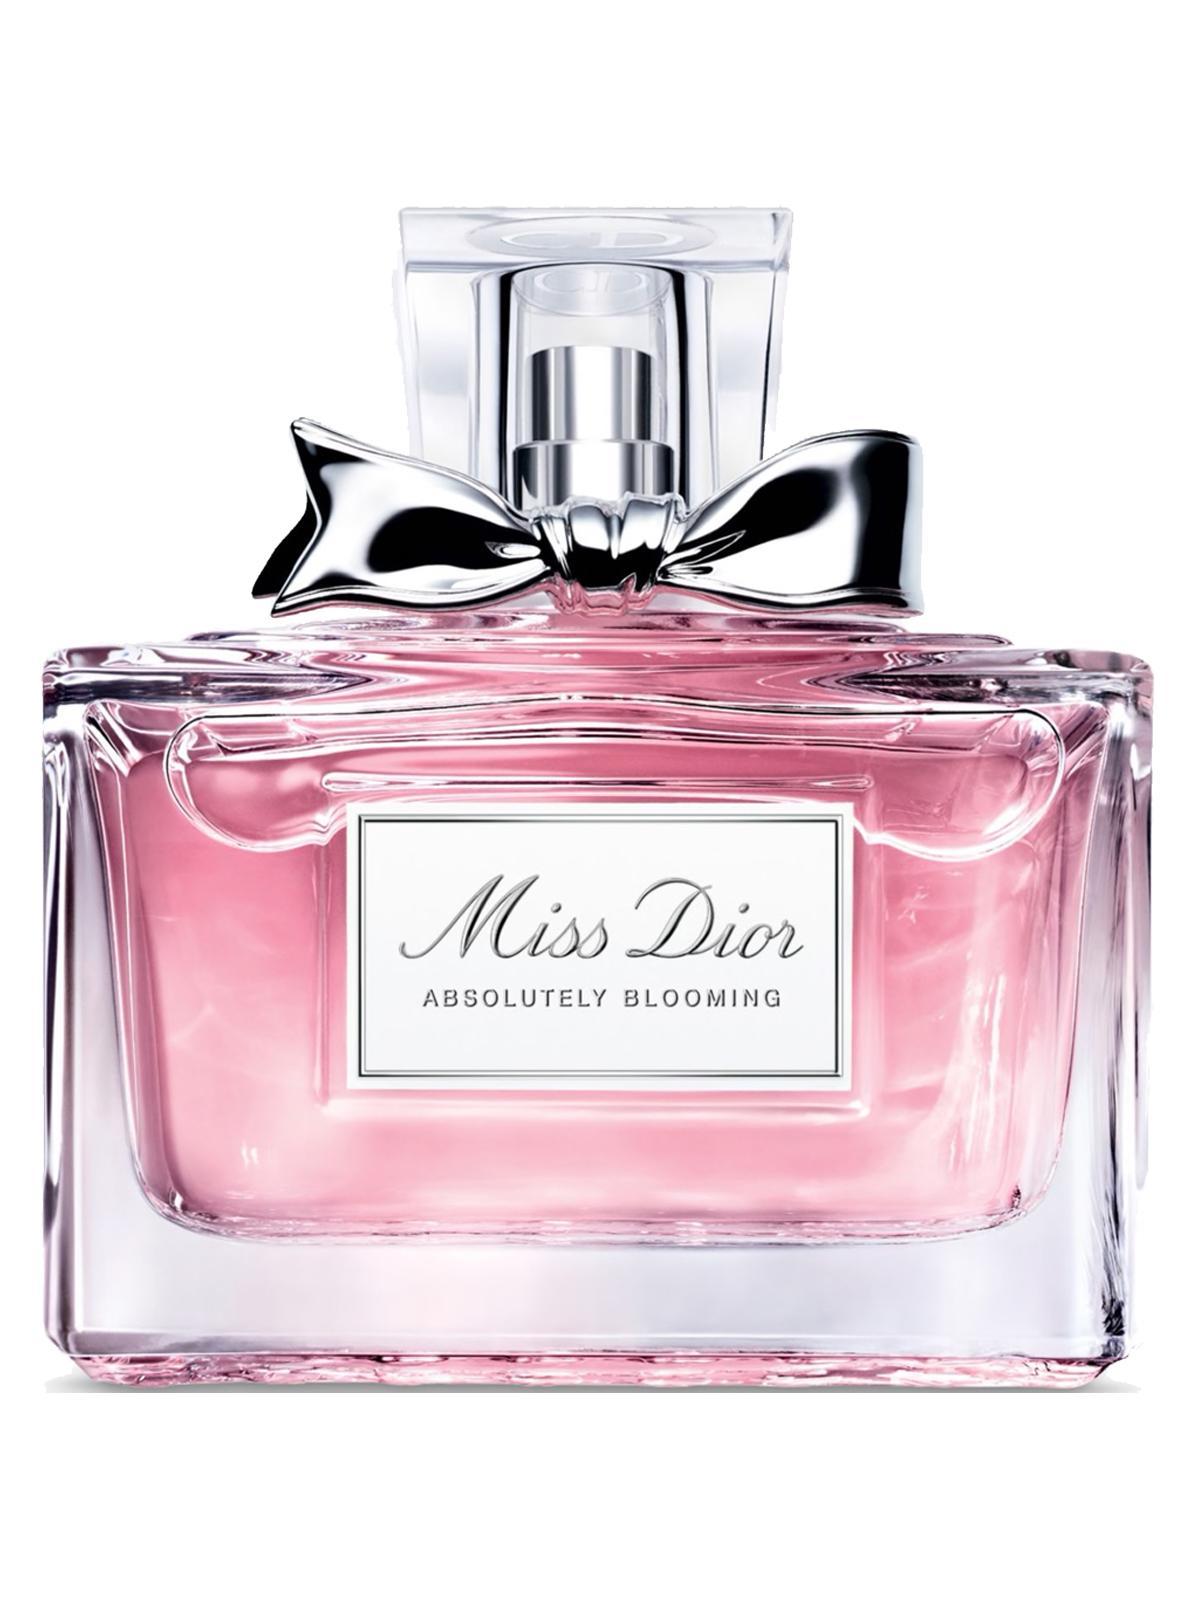 Dior Miss Dior Absolutely Blooming For Women Eau De Parfum 50ML